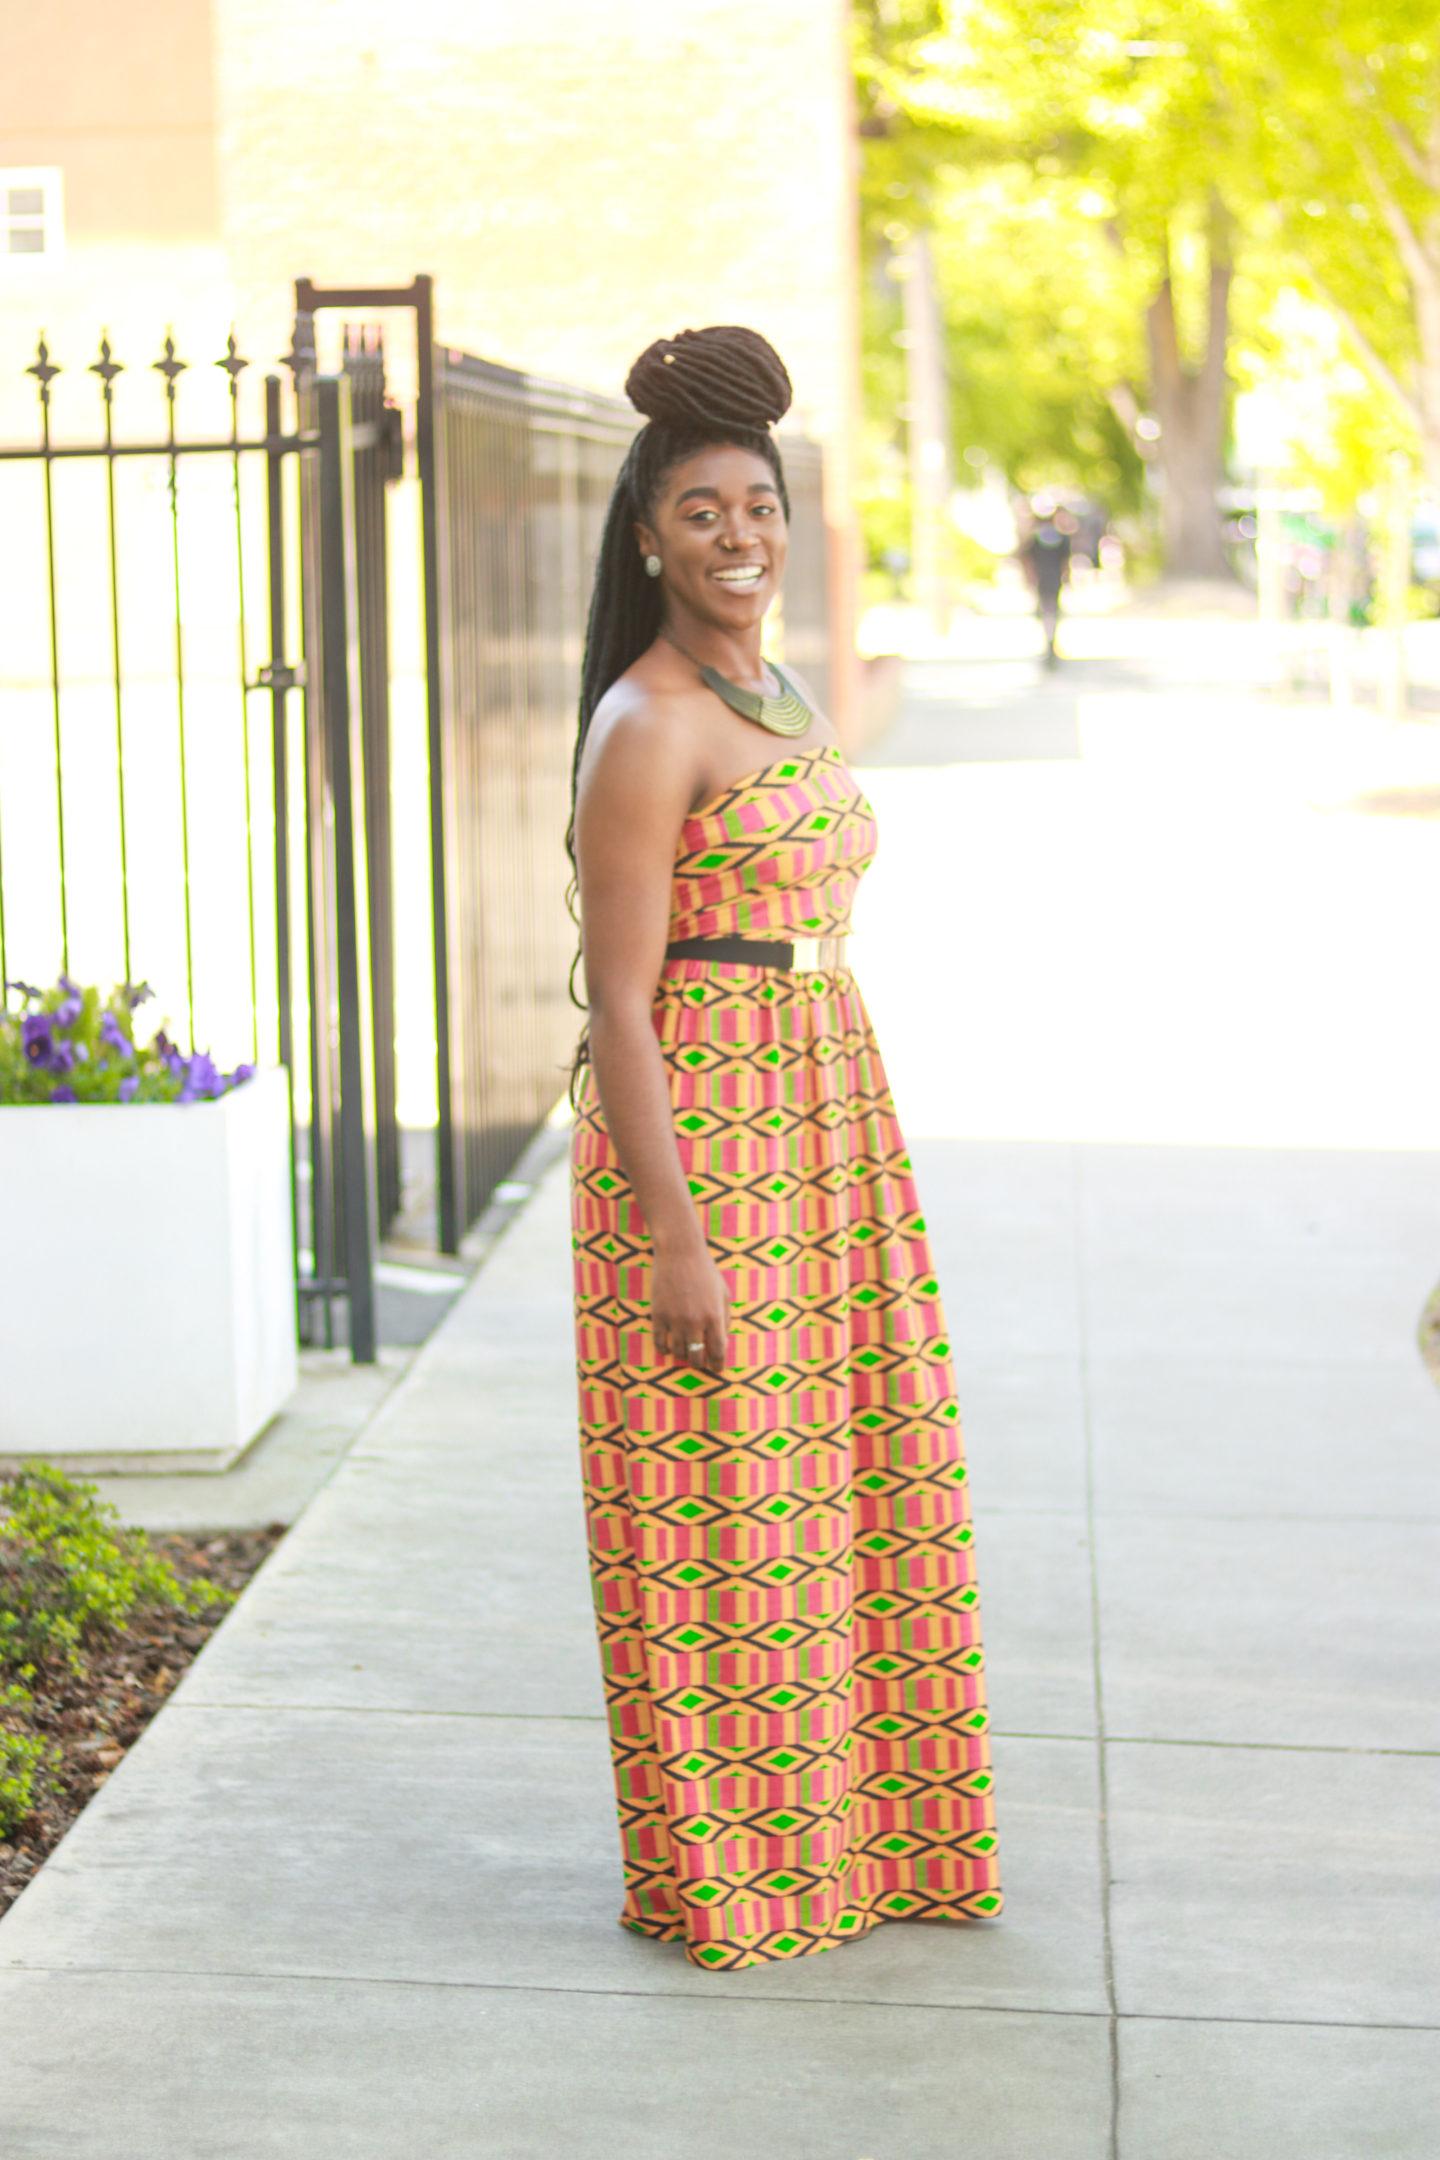 DIY Maxi Dress Tutorial   Sewing with Knit Fabric - Montoya Mayo